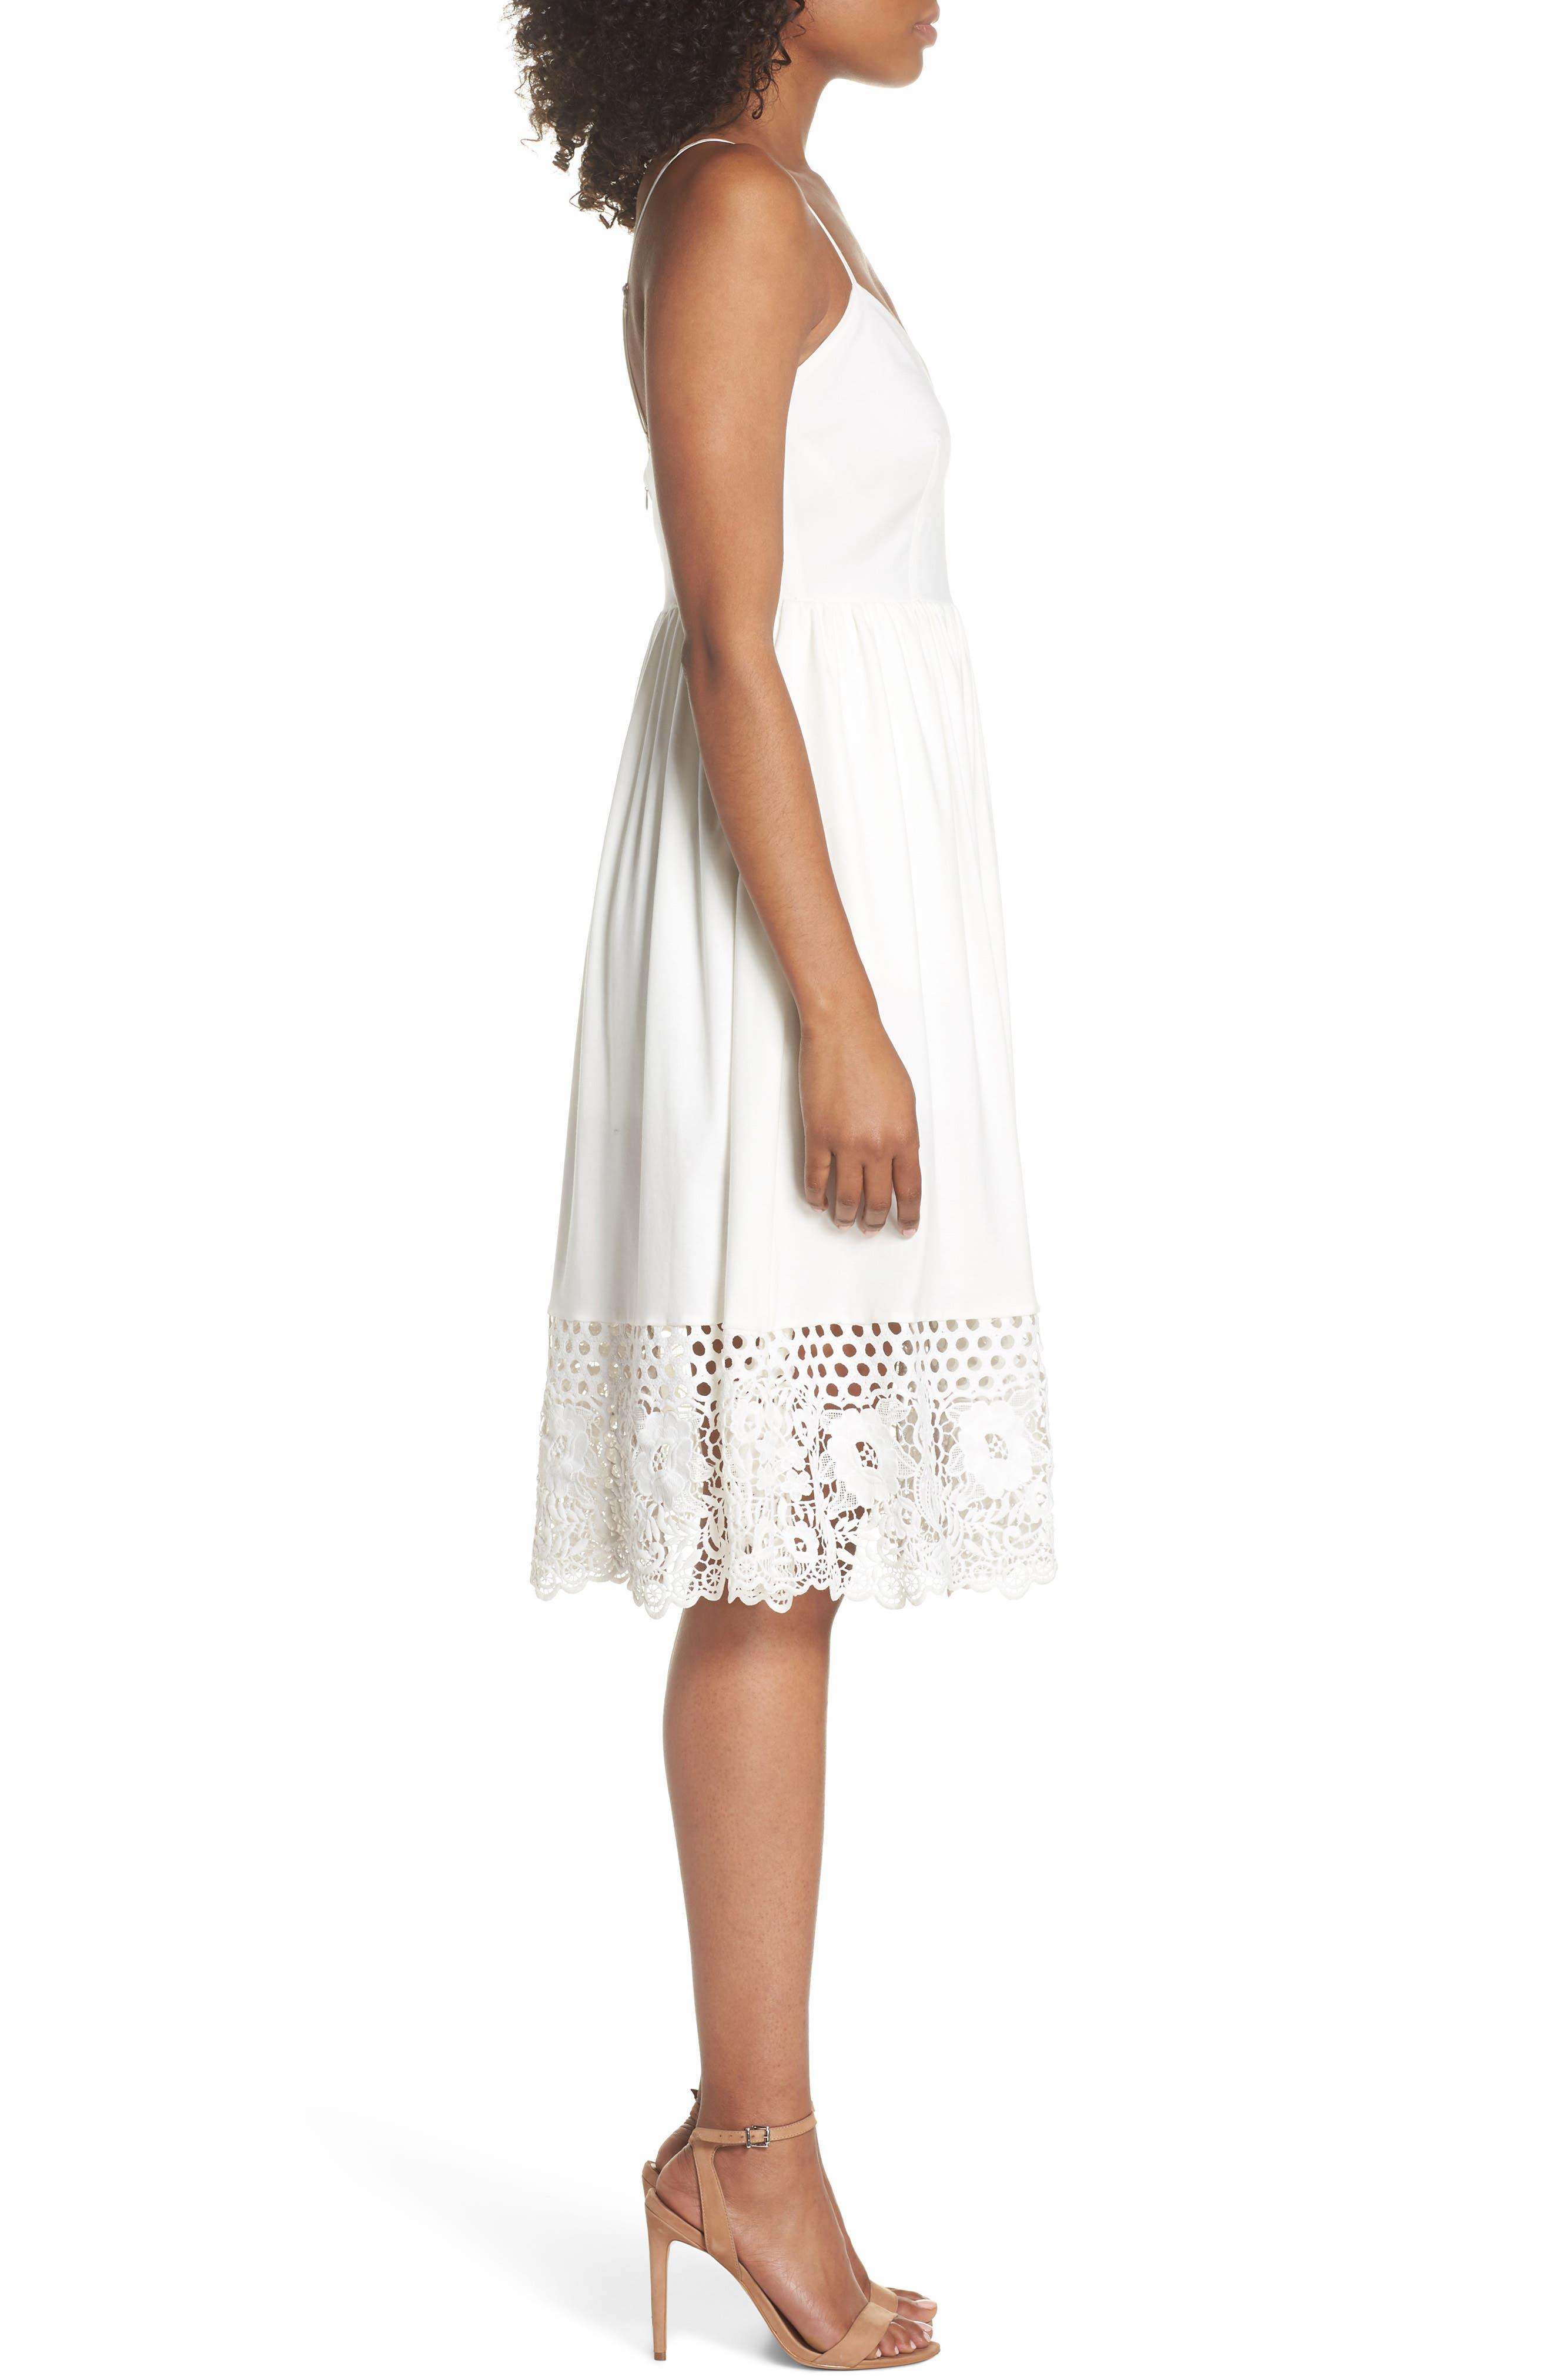 Salerno Lace Trim Jersey Dress,                             Alternate thumbnail 3, color,                             106